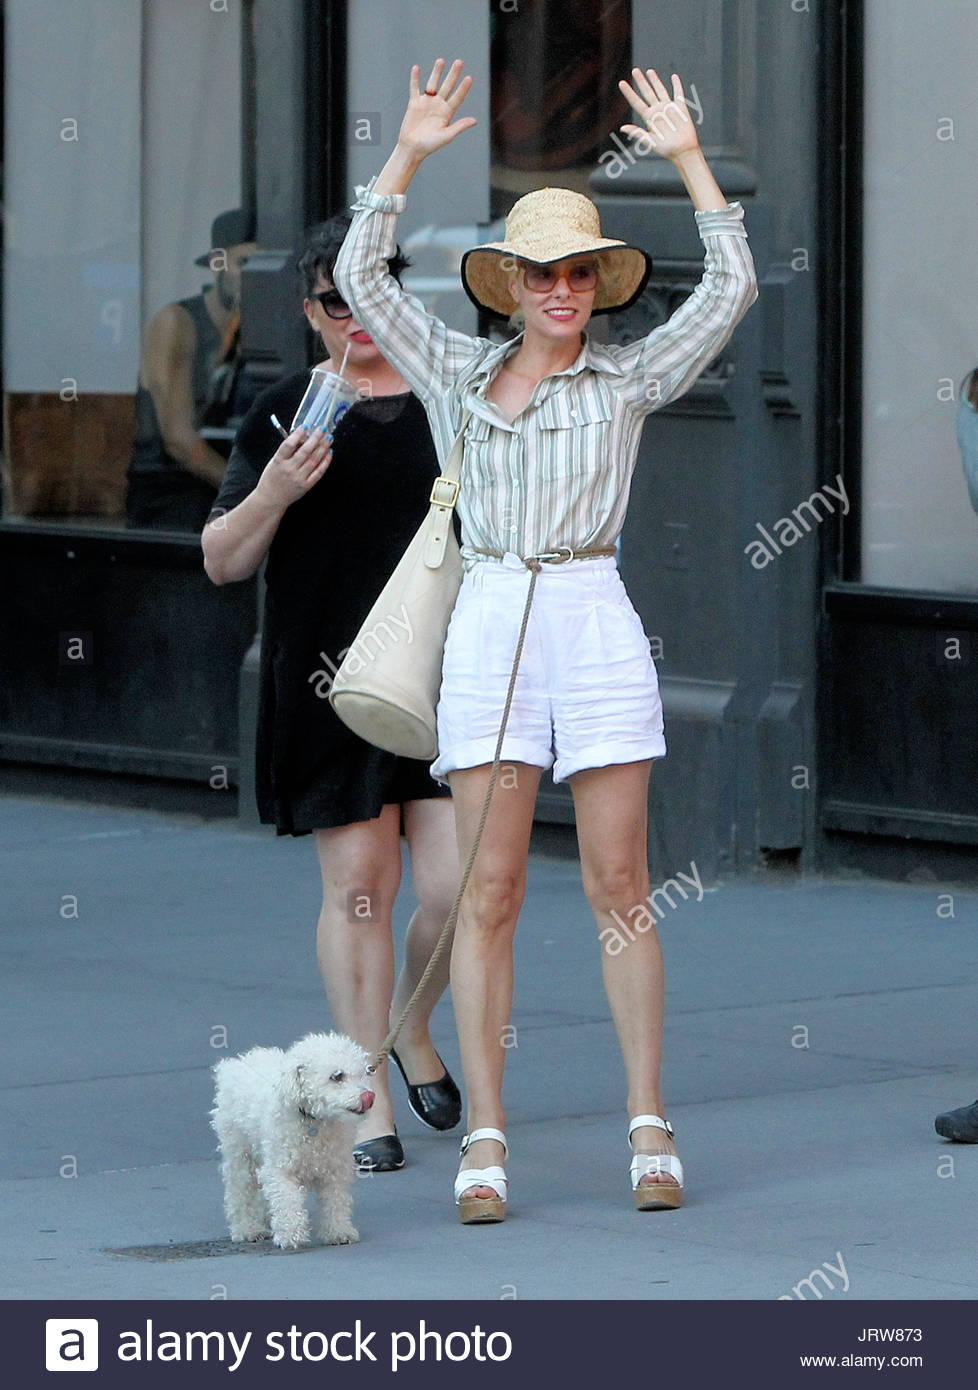 Minaei Noji born September 30, 1973 (age 45),Elizabeth Mitchell Hot tube Bobbie Eakes born July 25, 1961 (age 57),Cristina Gaioni